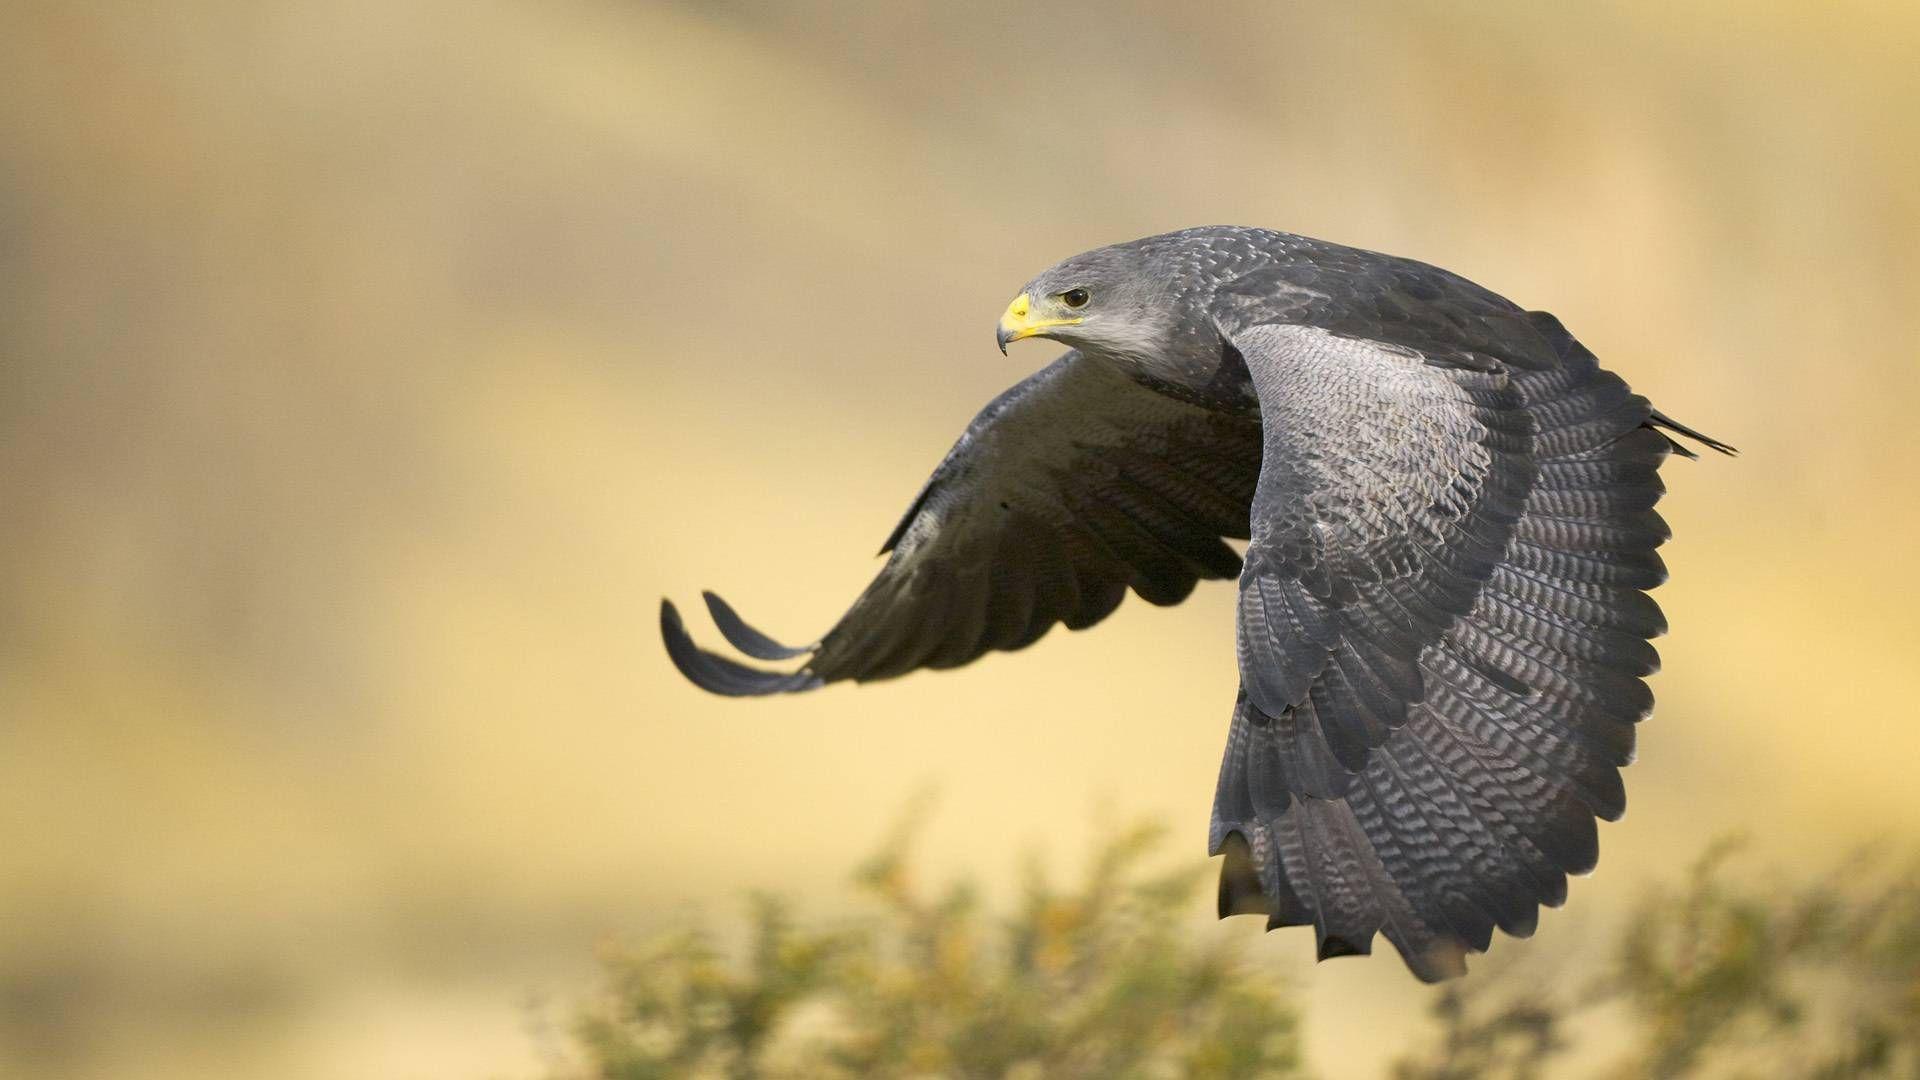 In flight #bird #nature #animal